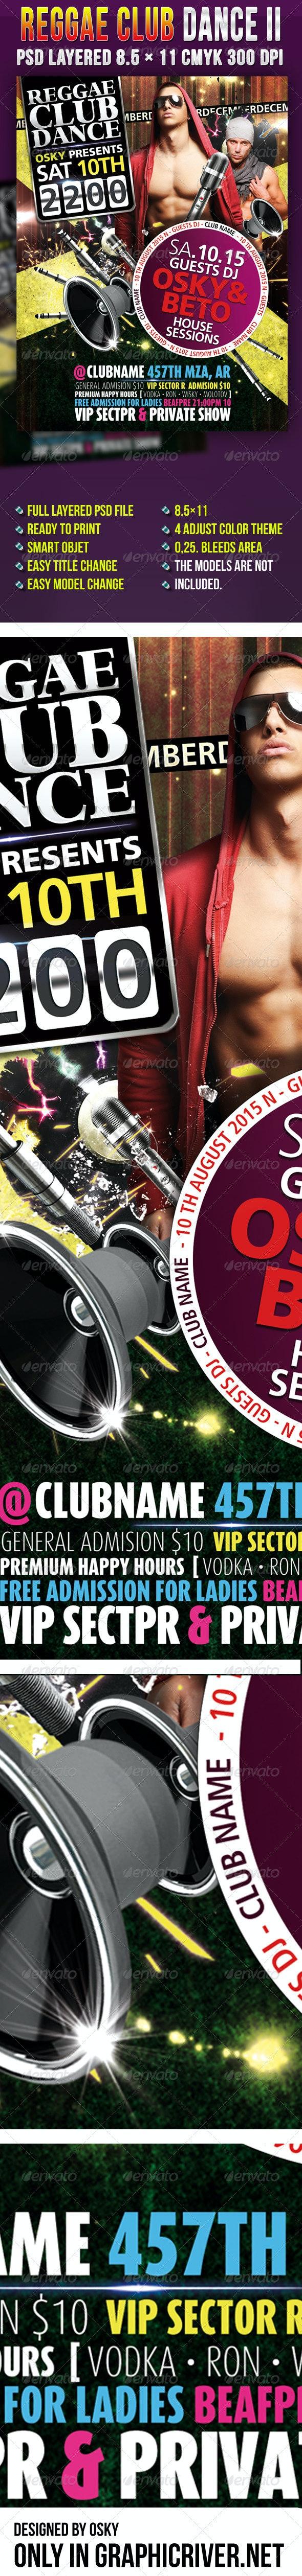 Reggae Club Dance II - Clubs & Parties Events